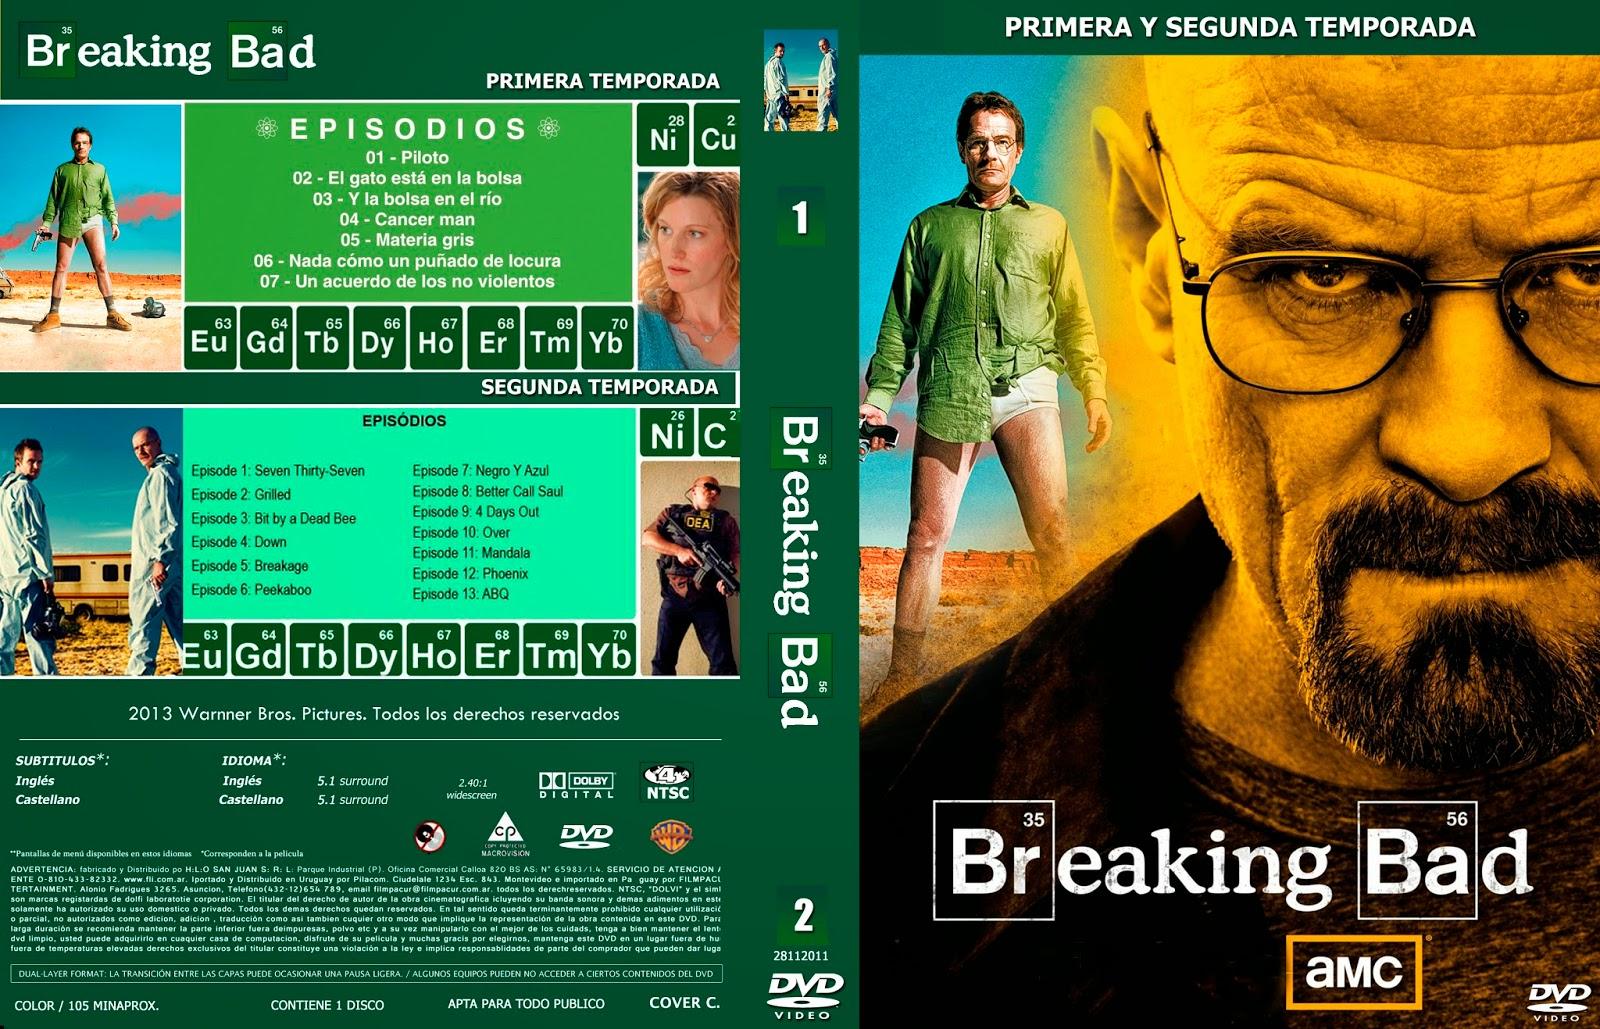 COVERCARATULAS DE DVD - CD COVERCREATORS: BREAKING BAD \